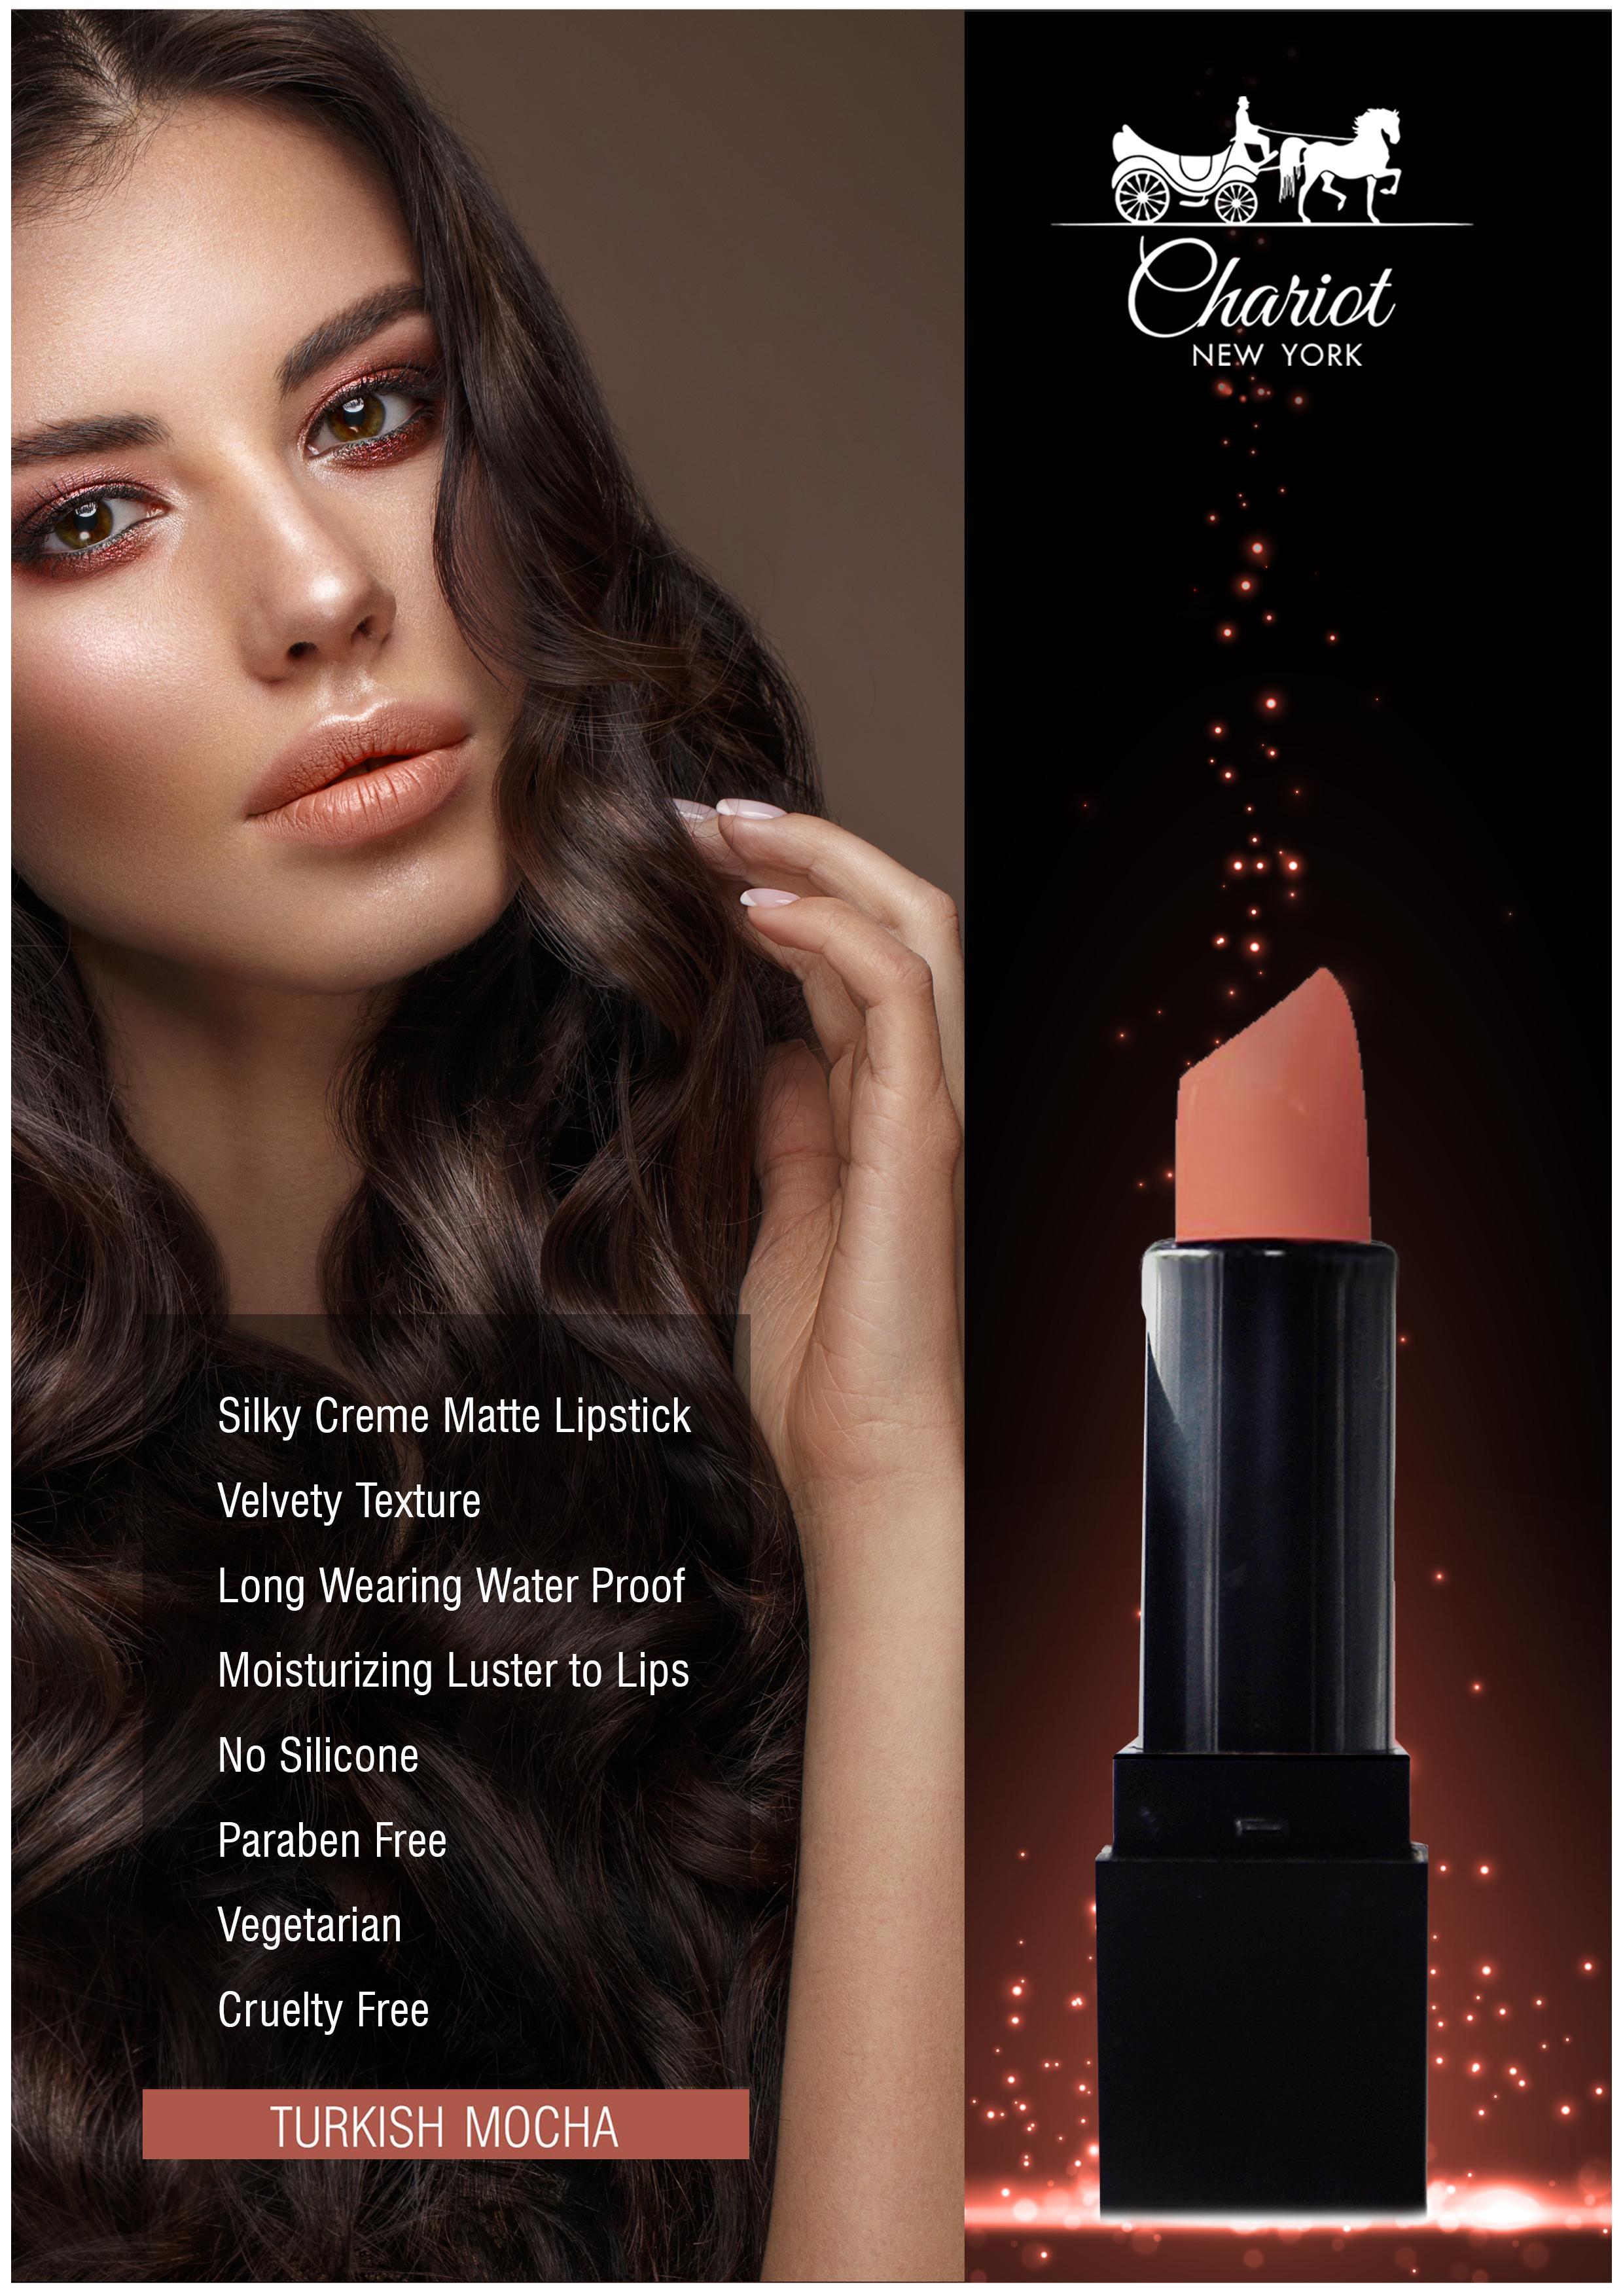 Chariot New York Turkish Mocha Lipstick (Chocolate)